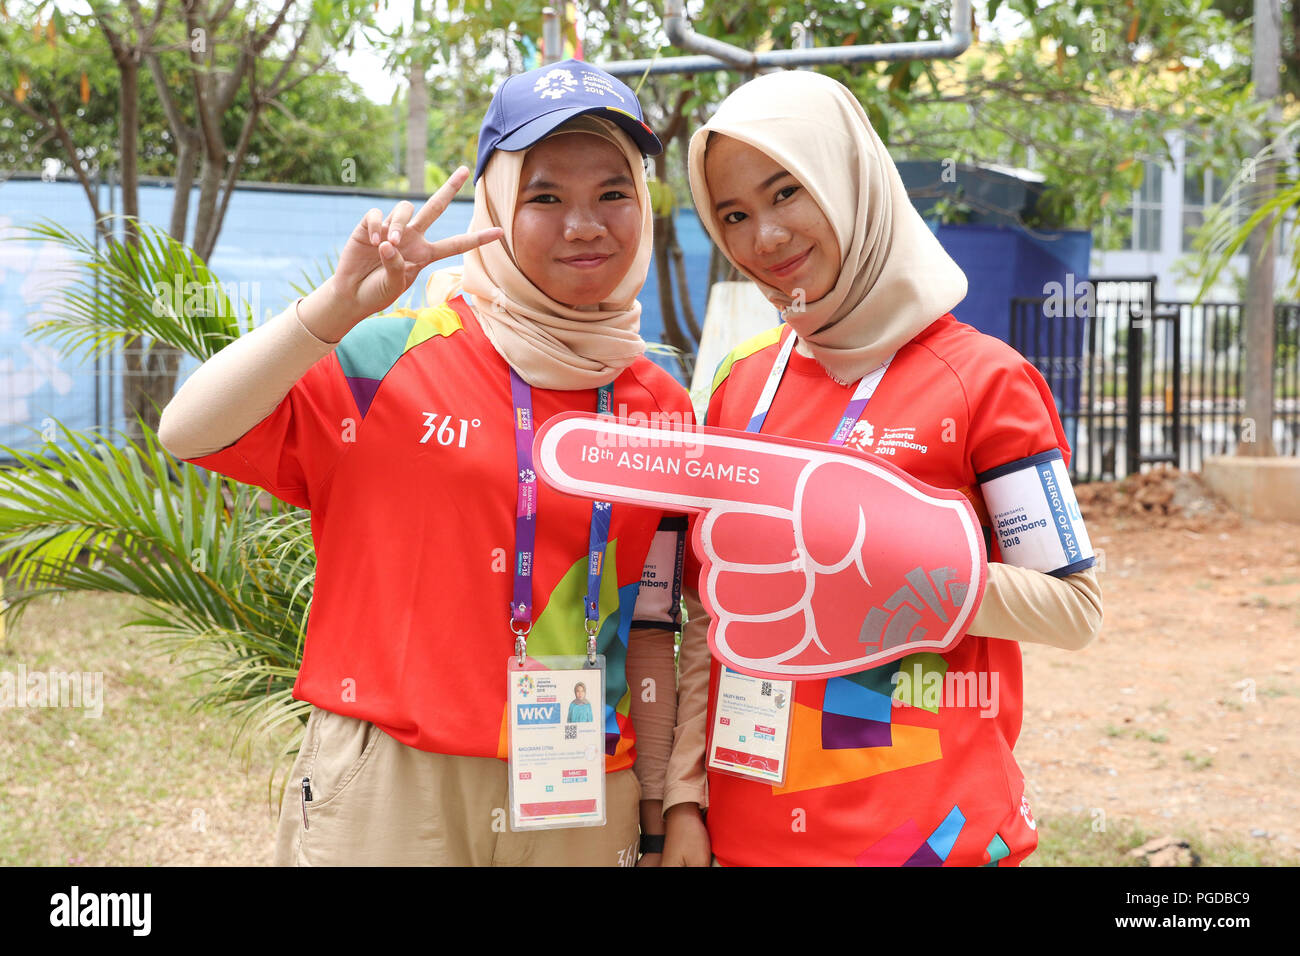 Volunteer, AUGUST 25, 2018 : the 2018 Jakarta Palembang Asian Games in Palembang, Indonesia. Credit: Yohei Osada/AFLO SPORT/Alamy Live News - Stock Image